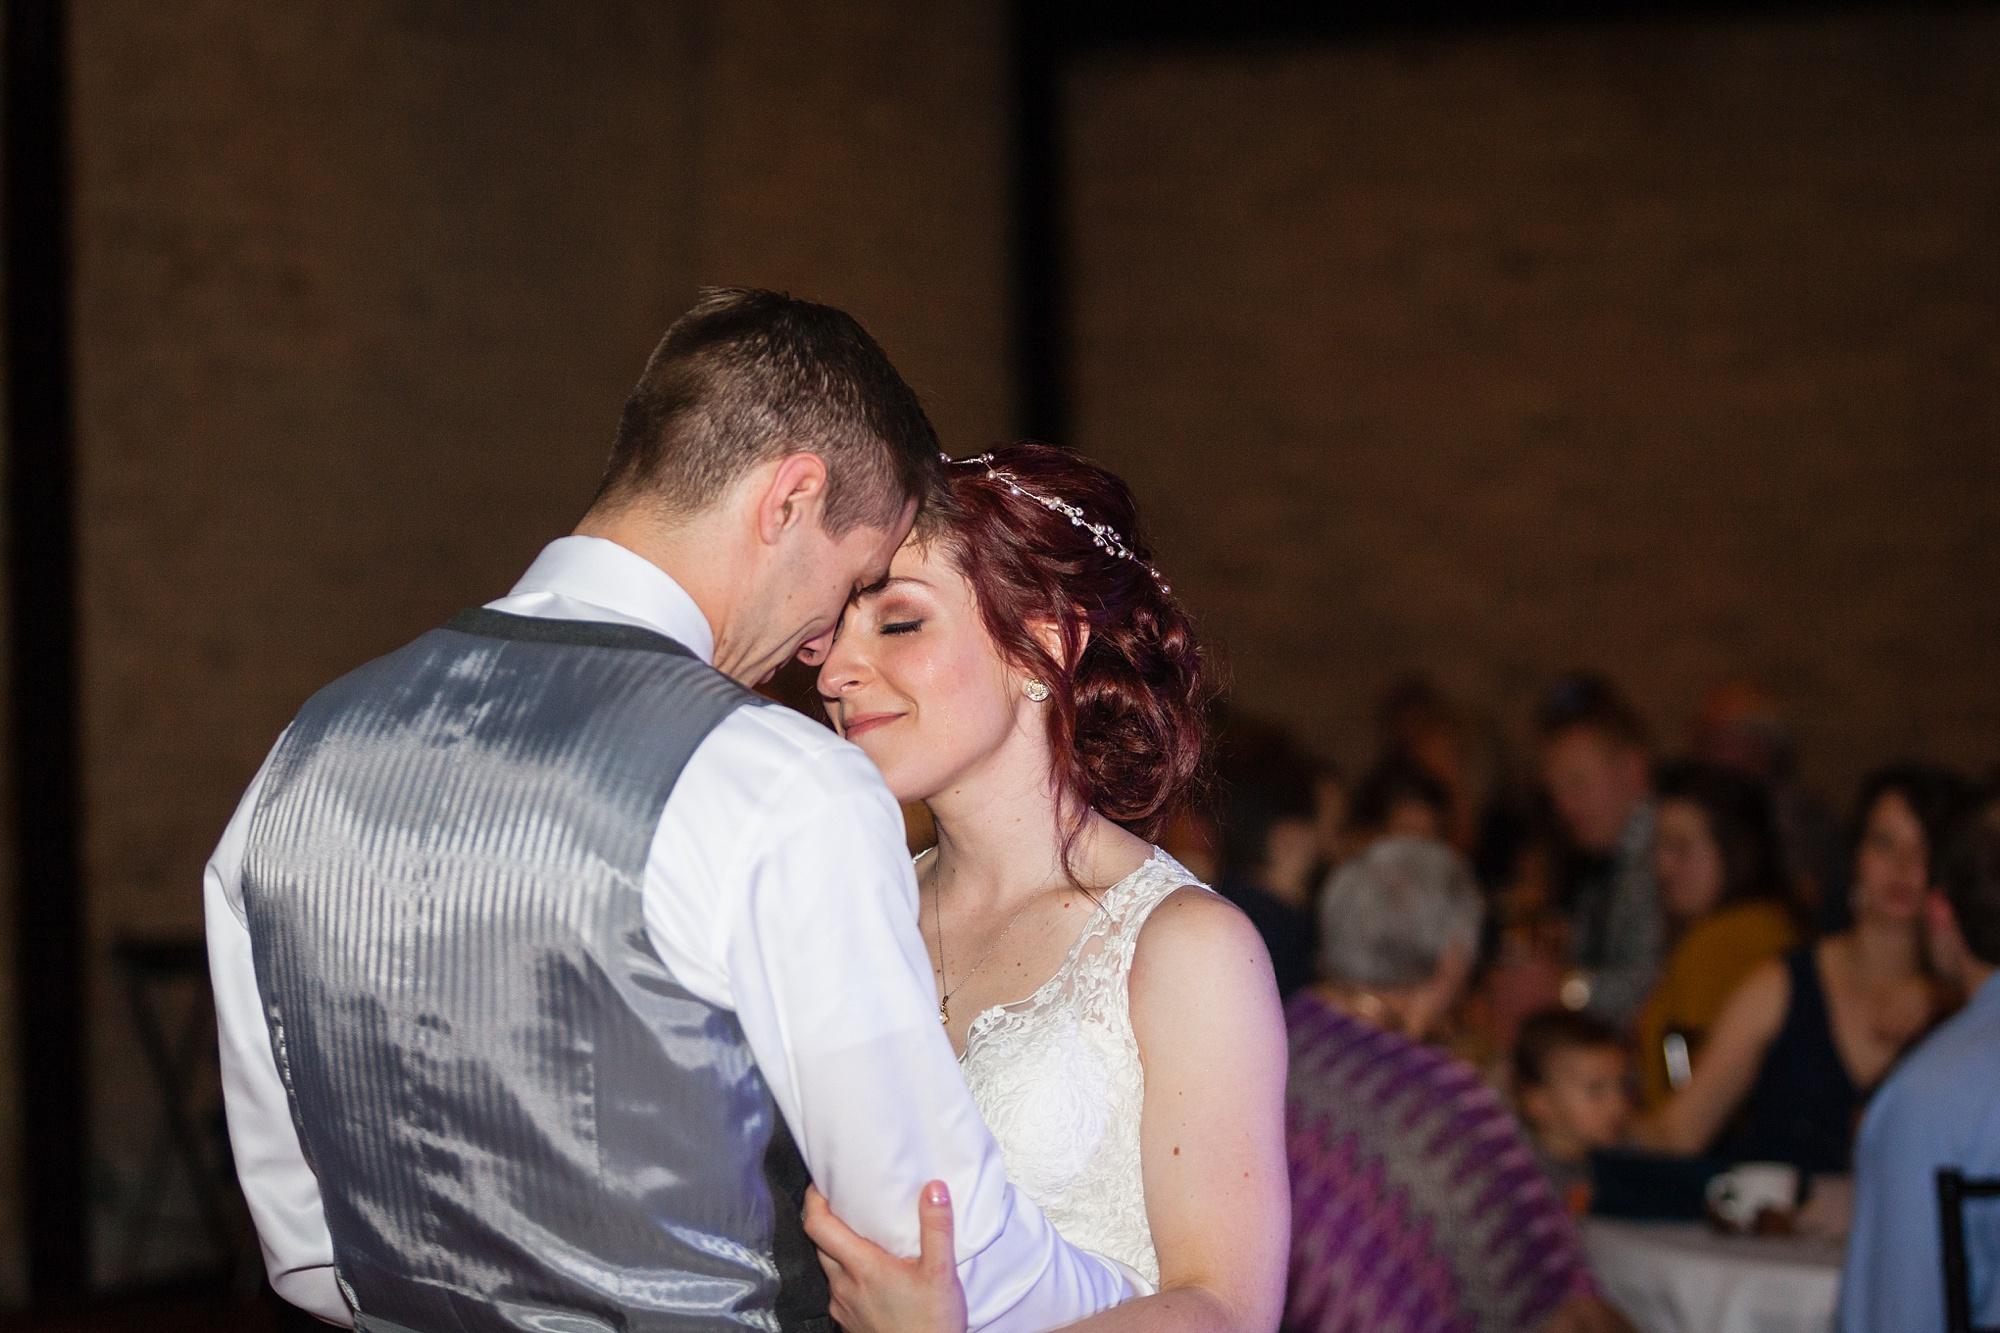 Brandon_Shafer_Photography_Lauren_Ethan_New_Vintage_Place_Grand_Rapids_Wedding_0050.jpg